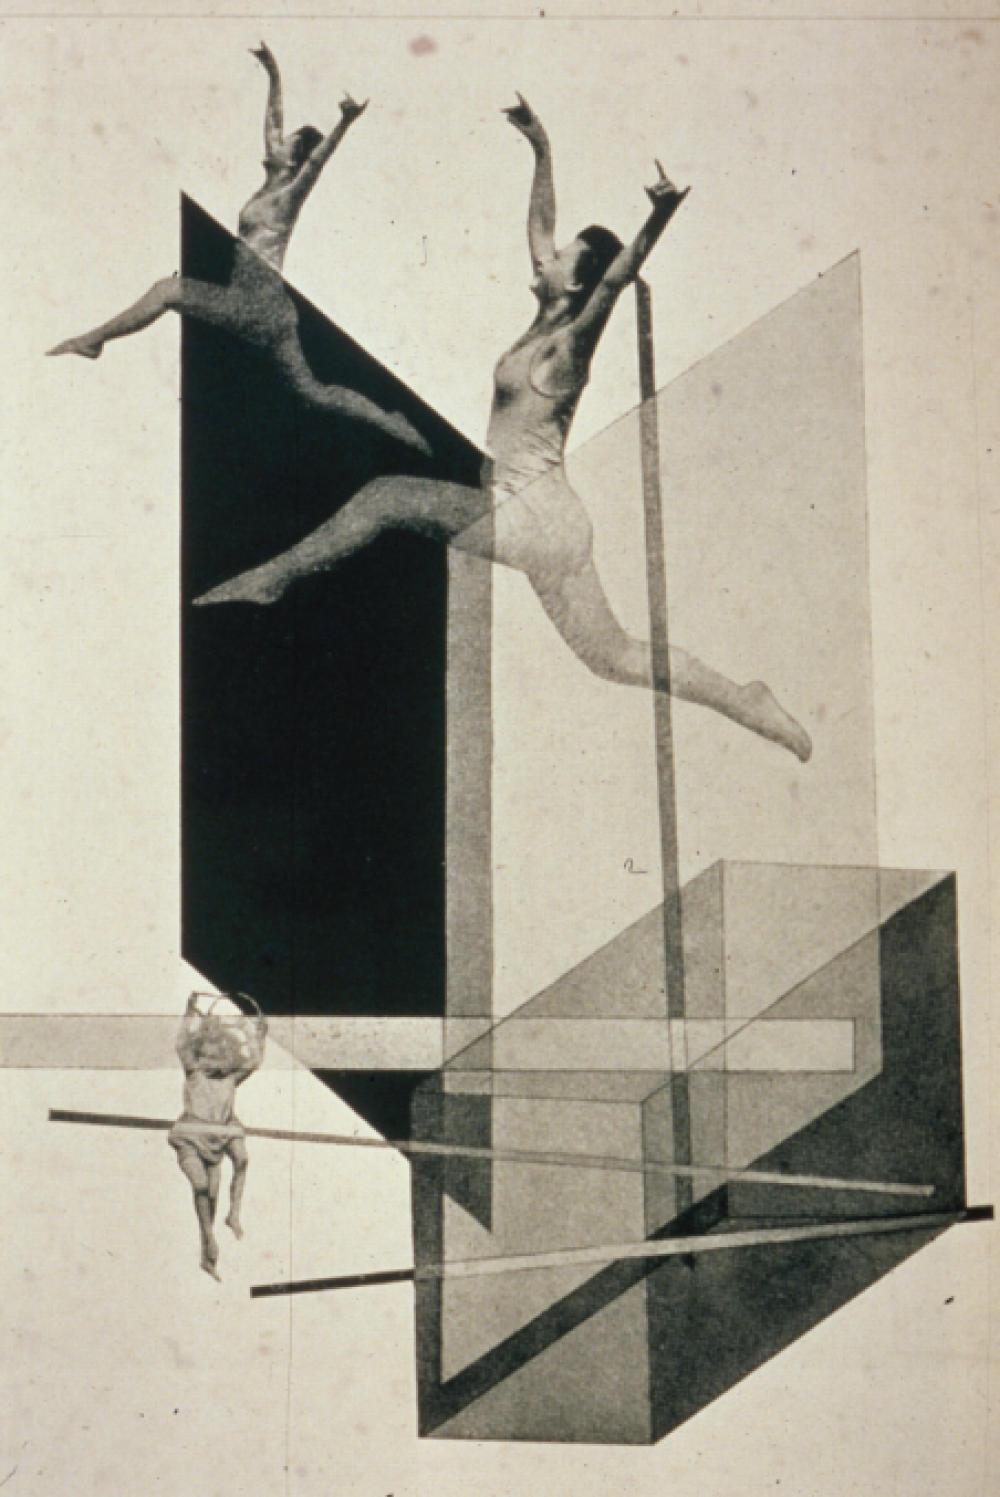 Human Mechanics - Laszlo Moholy-Nagy